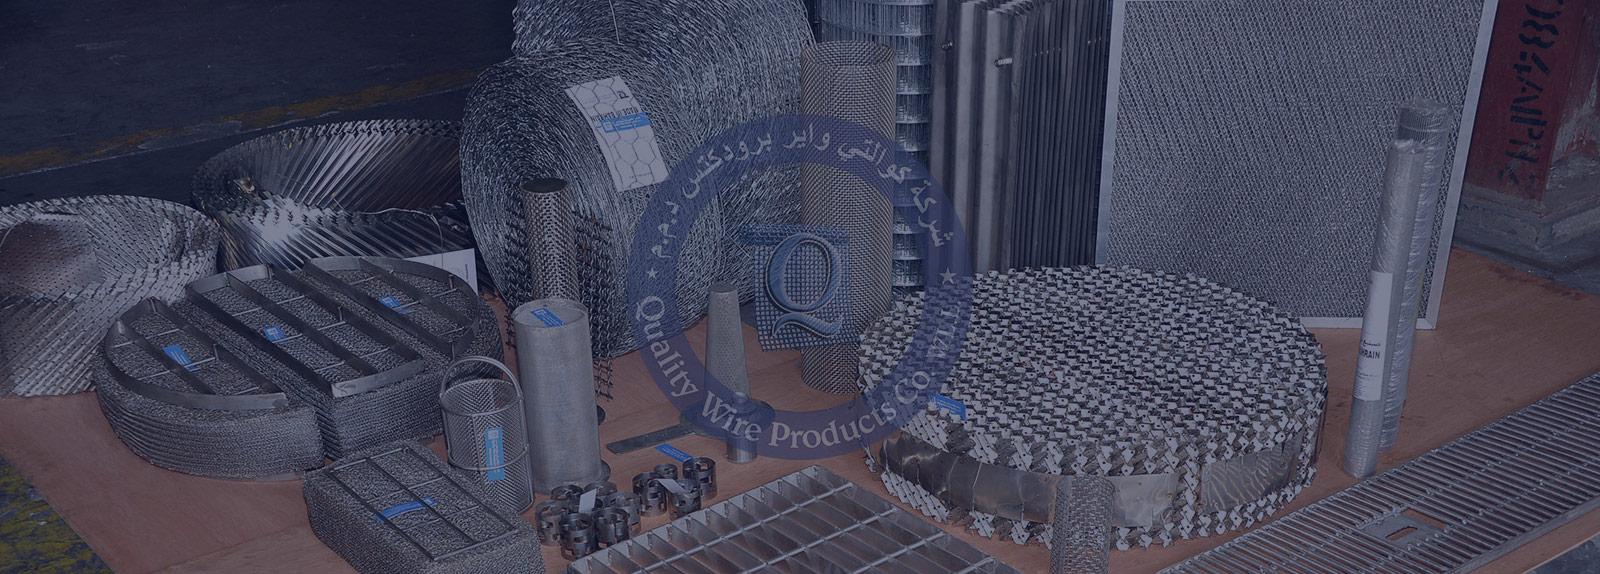 welded_wire_mesh Dubai